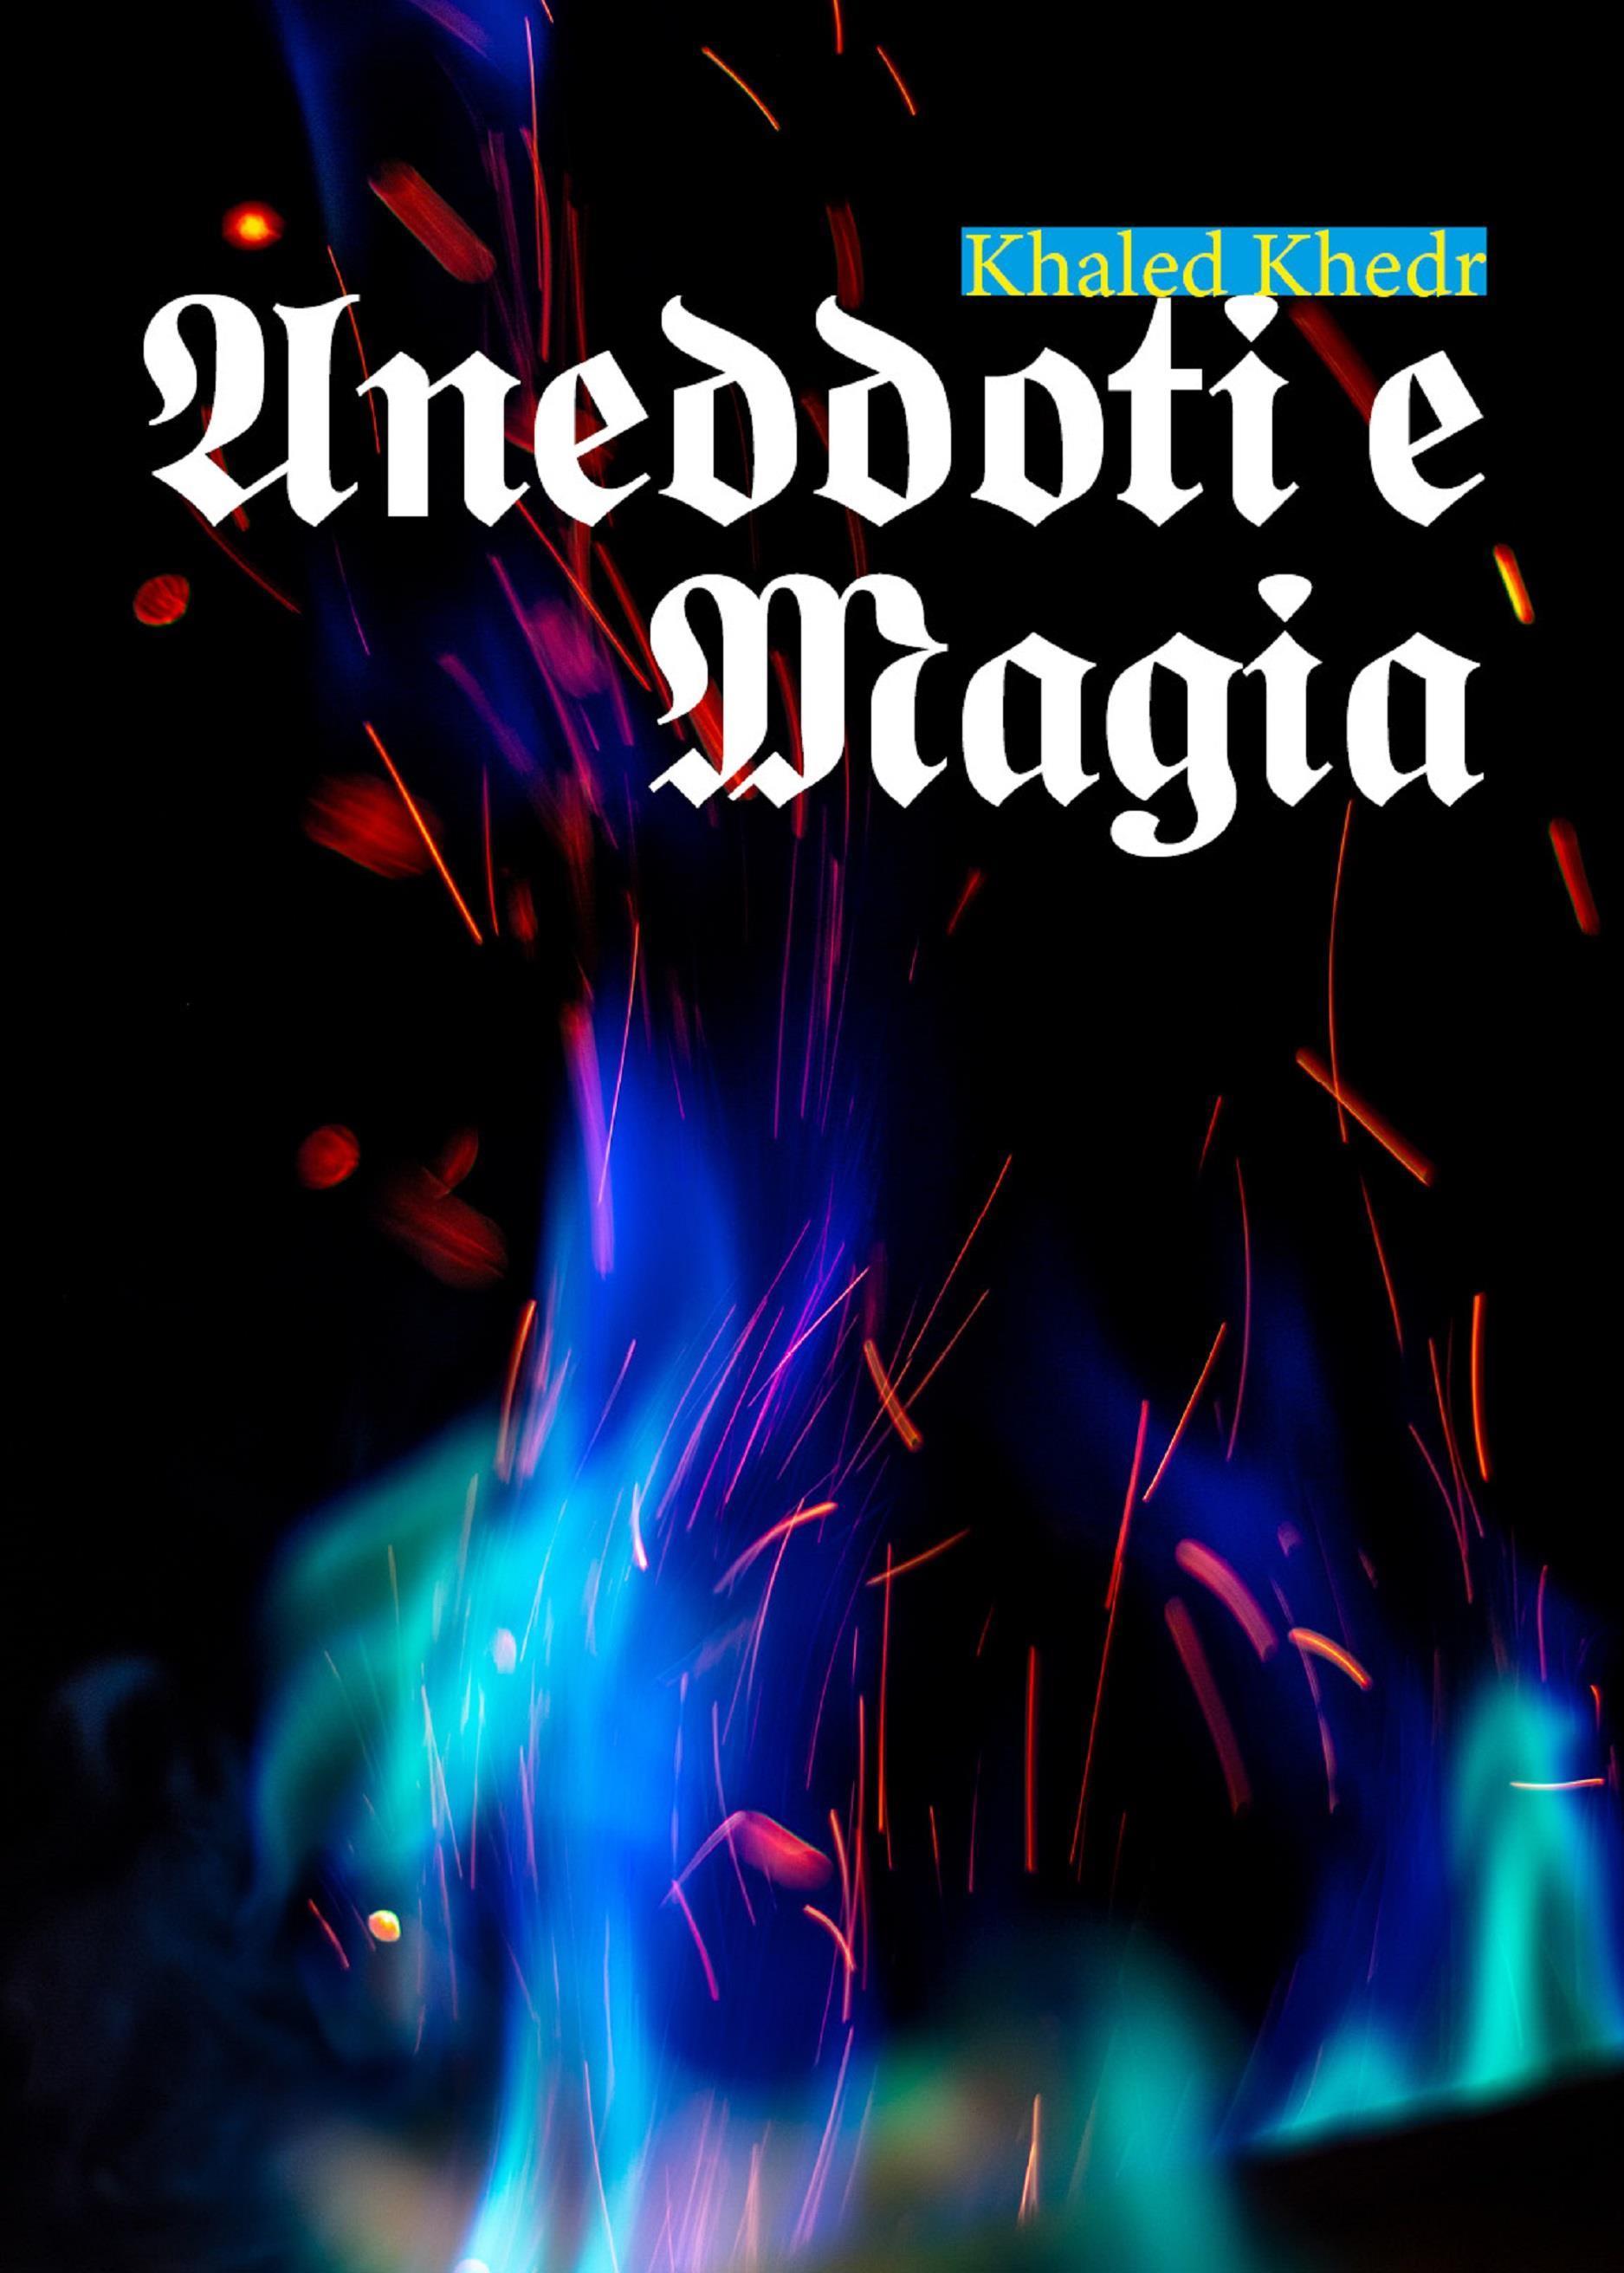 Aneddoti e magia